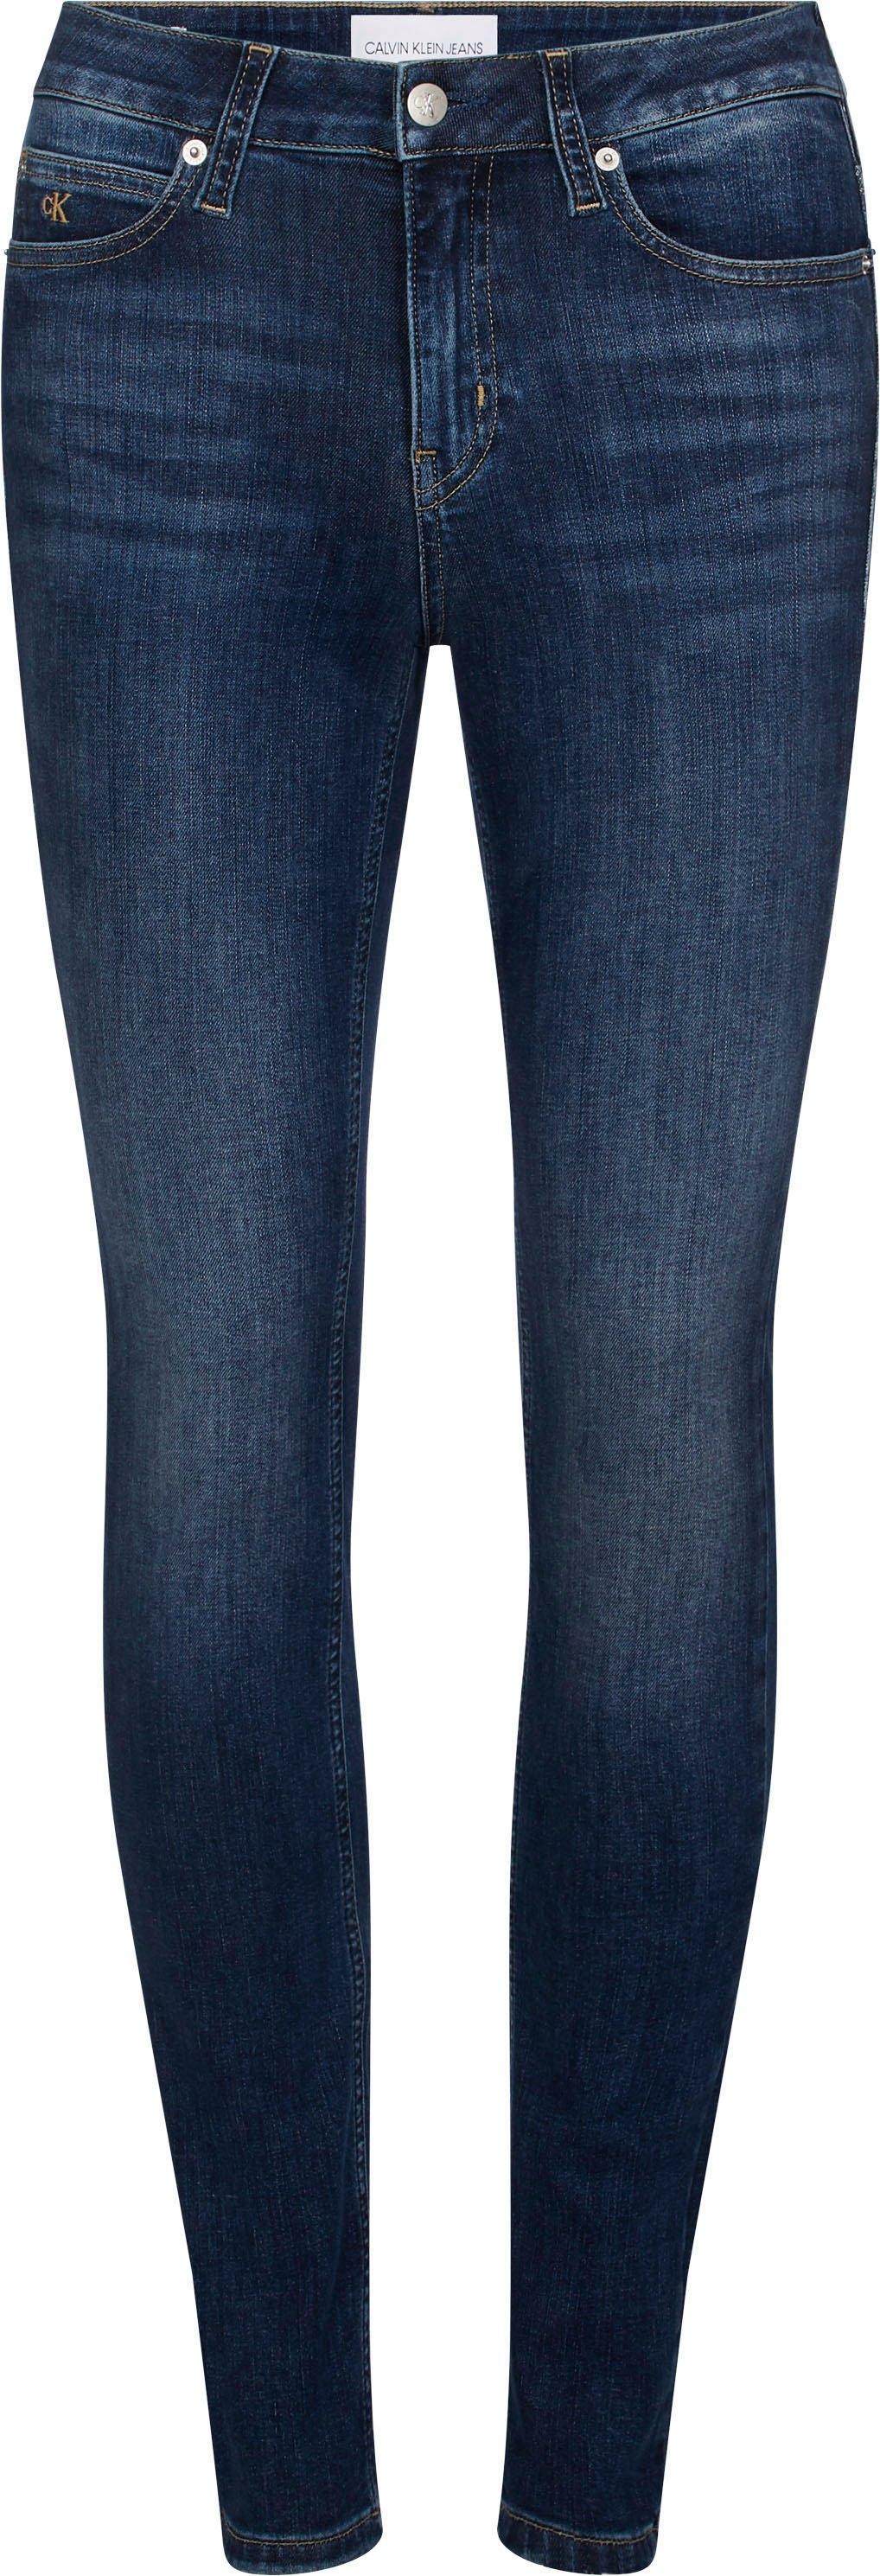 Calvin Klein skinny fit jeans CKJ 011 MID RISE SKINNY met fadeout effect,jeans merklabel & ck borduursel in de webshop van OTTO kopen